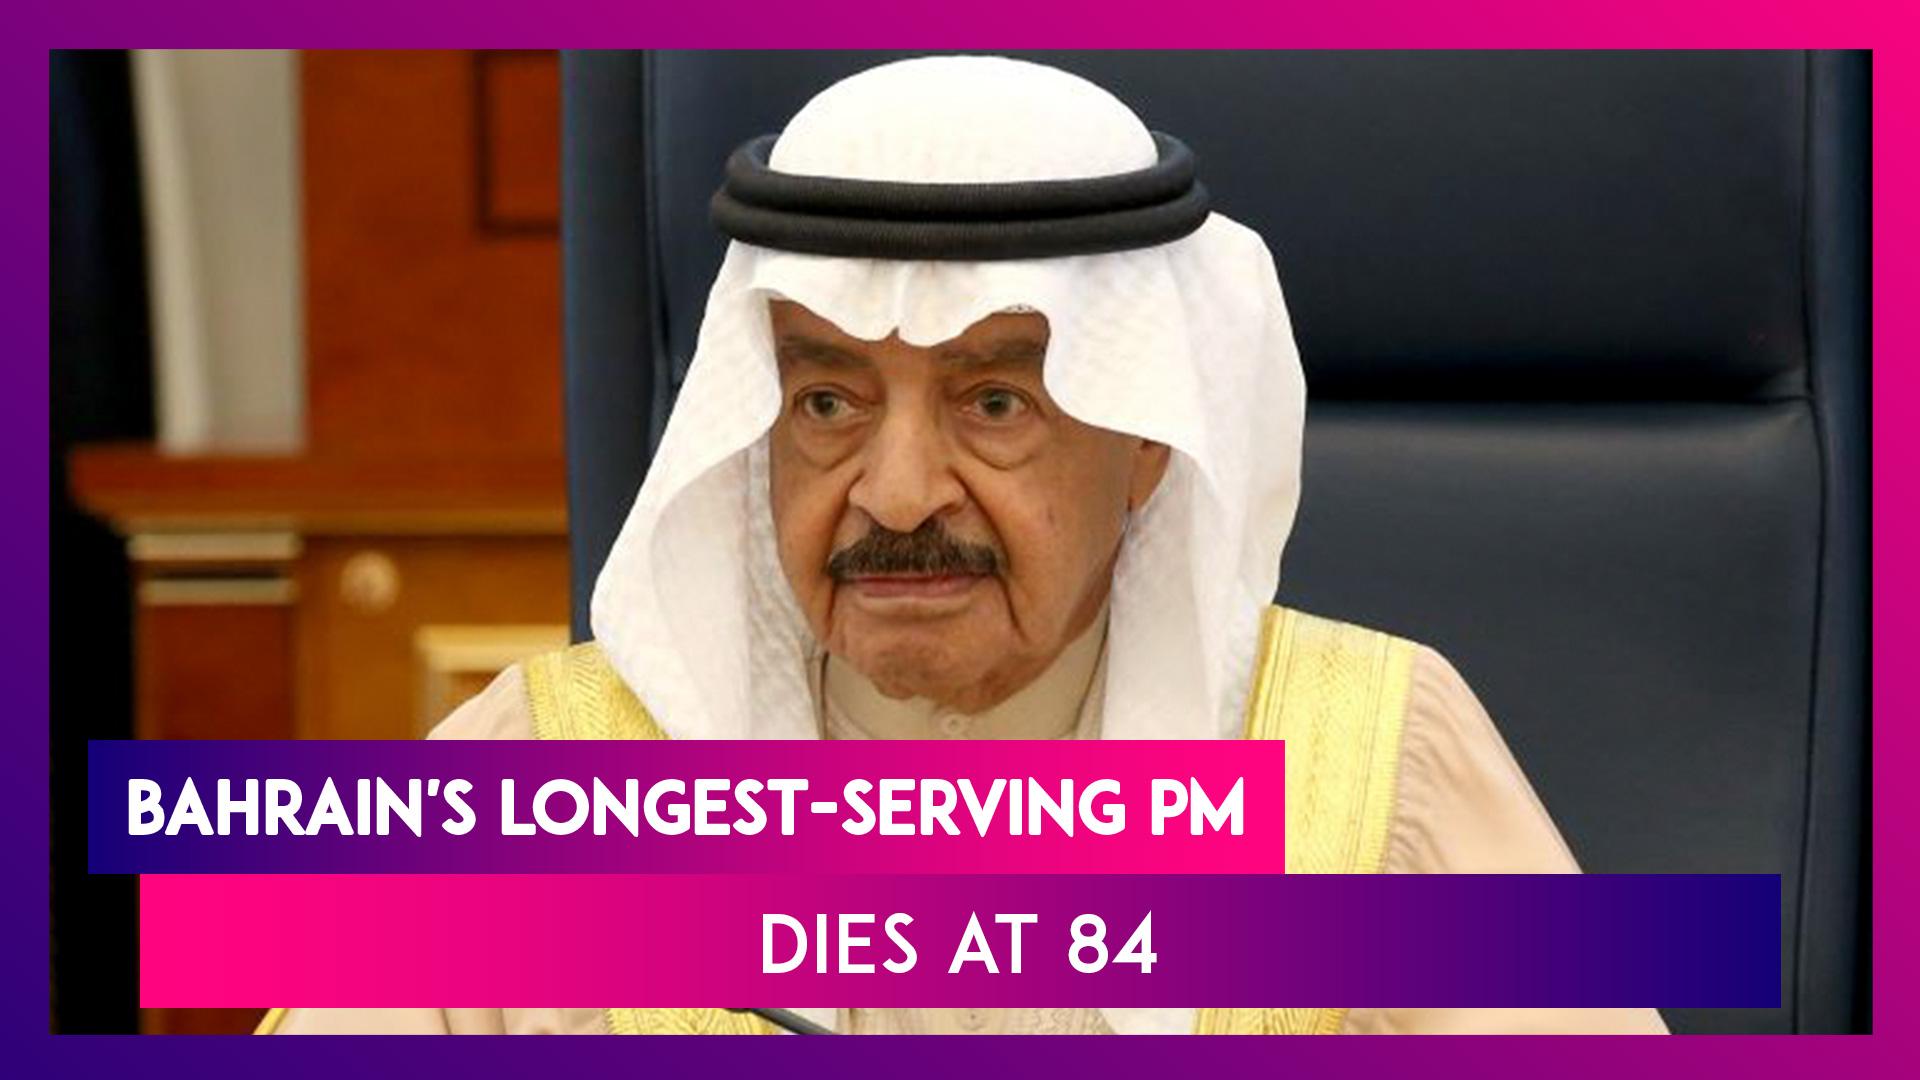 Khalifa Bin Salman Al Khalifa Dies At 84; Everything You Need To Know About Bahrain's Longest-Serving PM